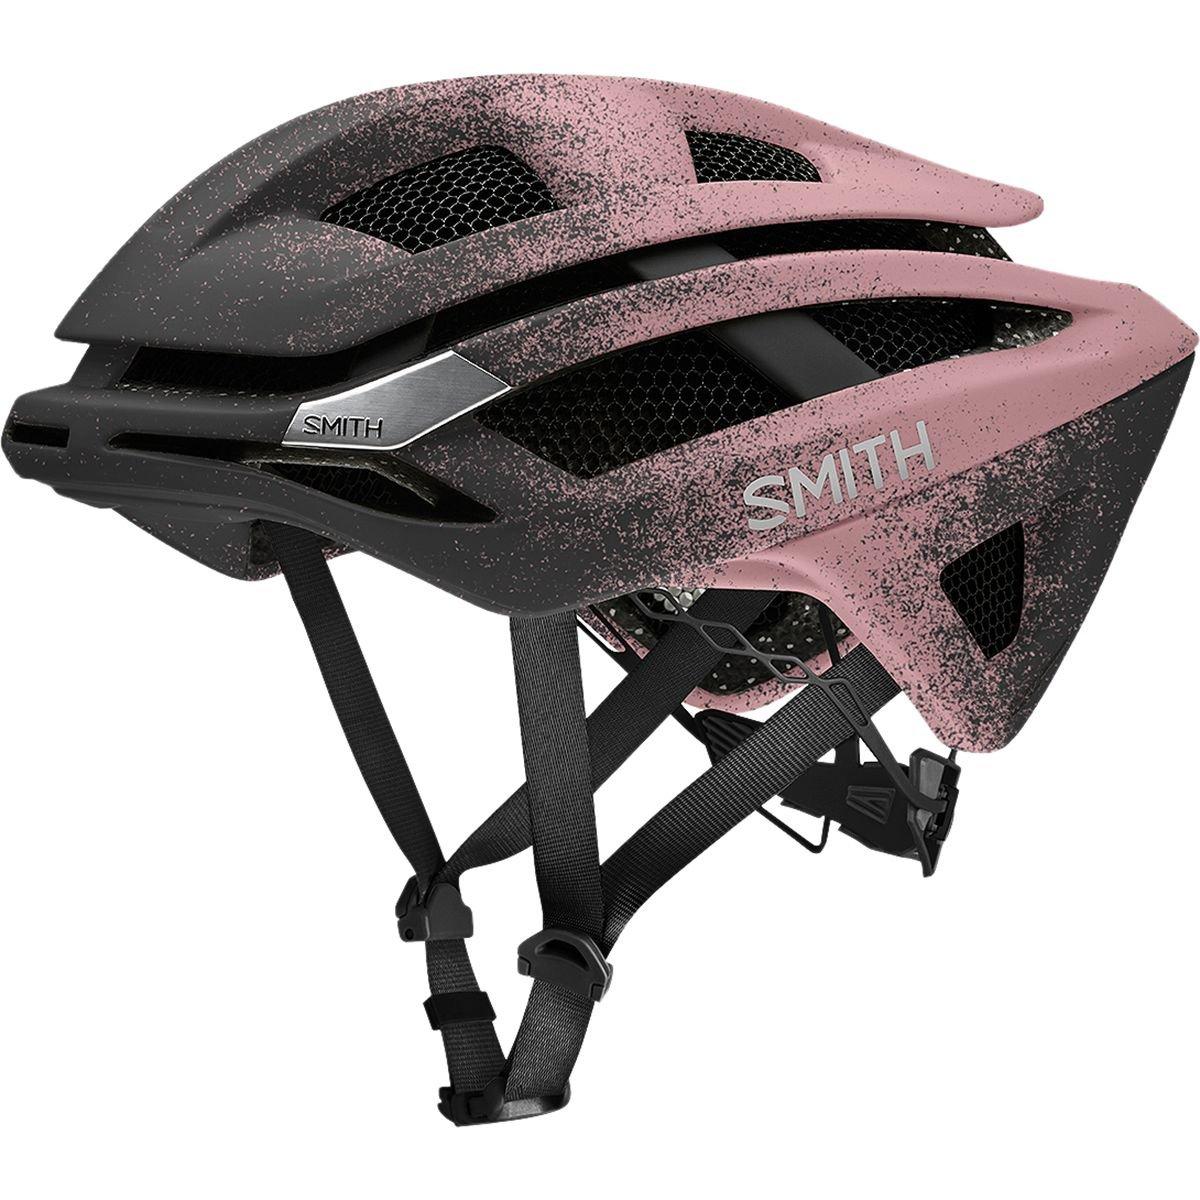 Smith Optics Overtake MIPS Adult MTB Cycling Helmet - Matte Dust Rose Small